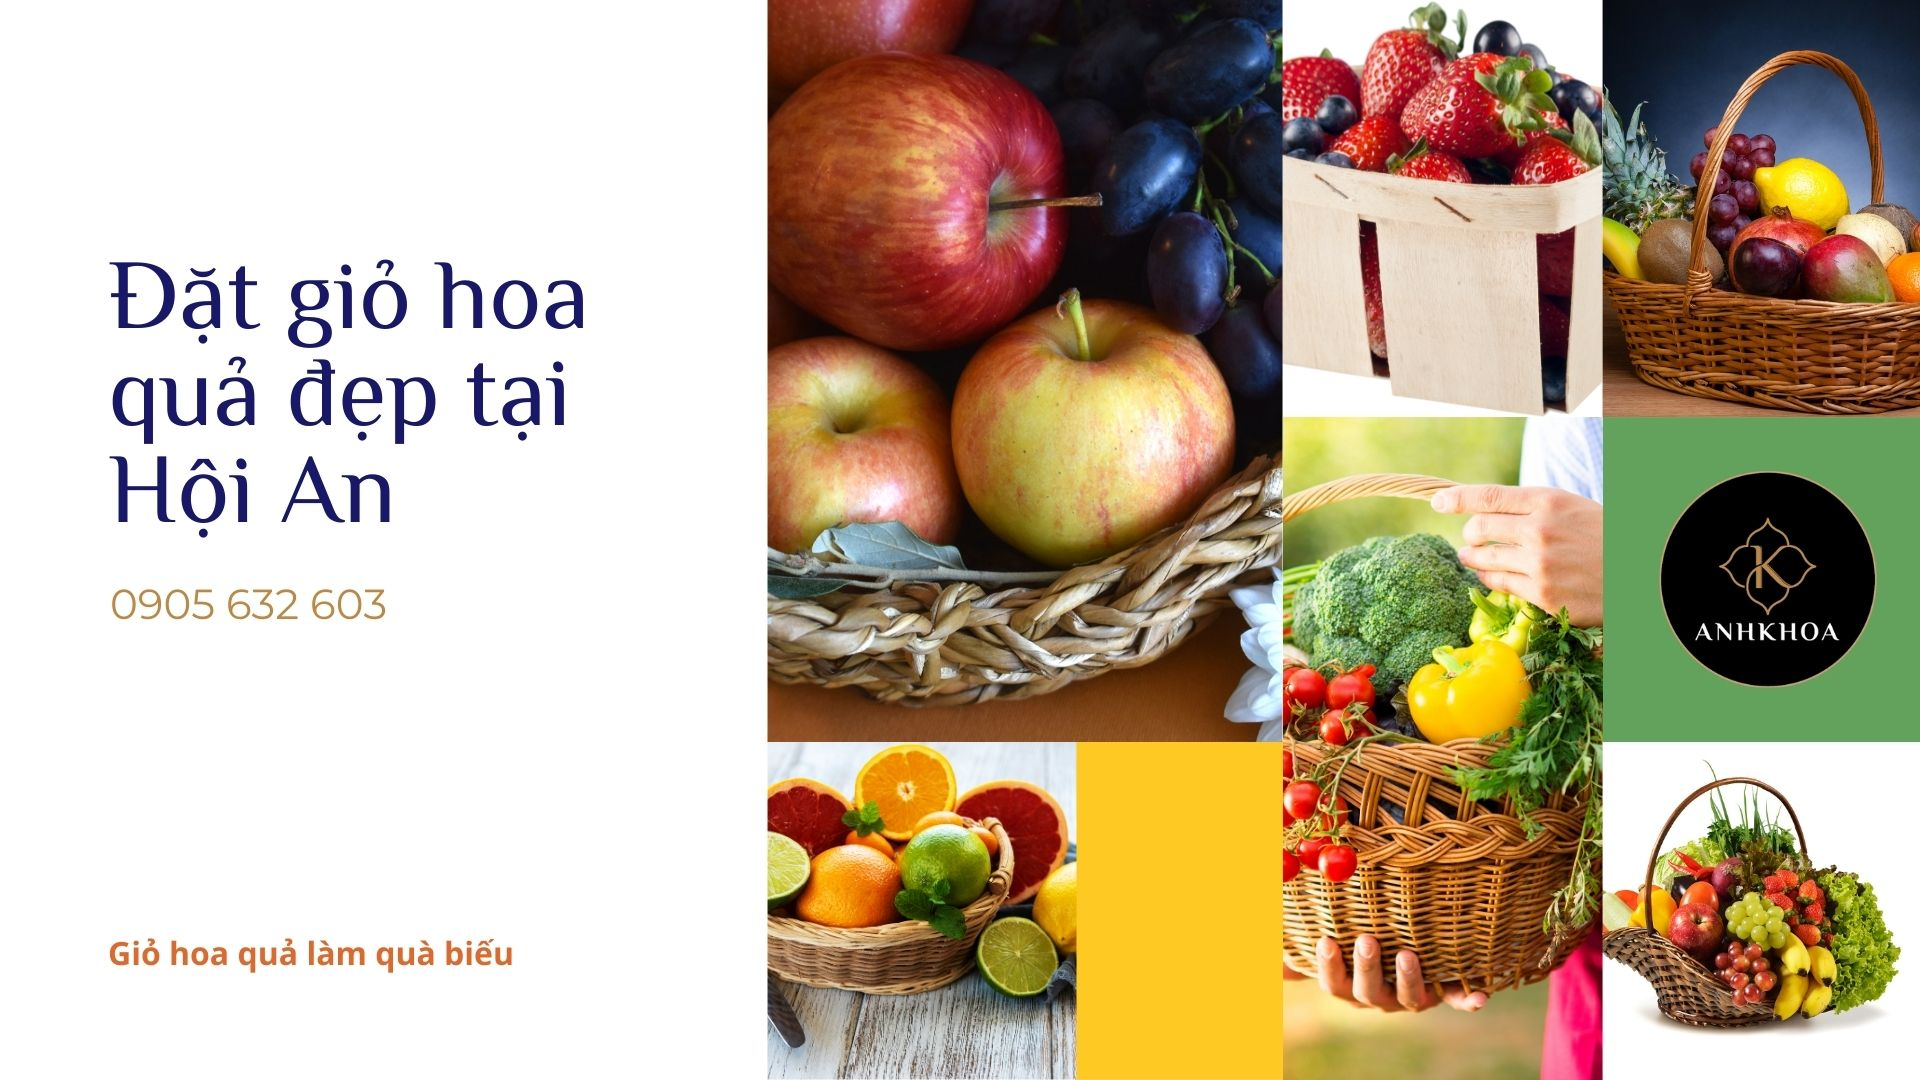 Đặt giỏ hoa quả cao cấp tại Hội An